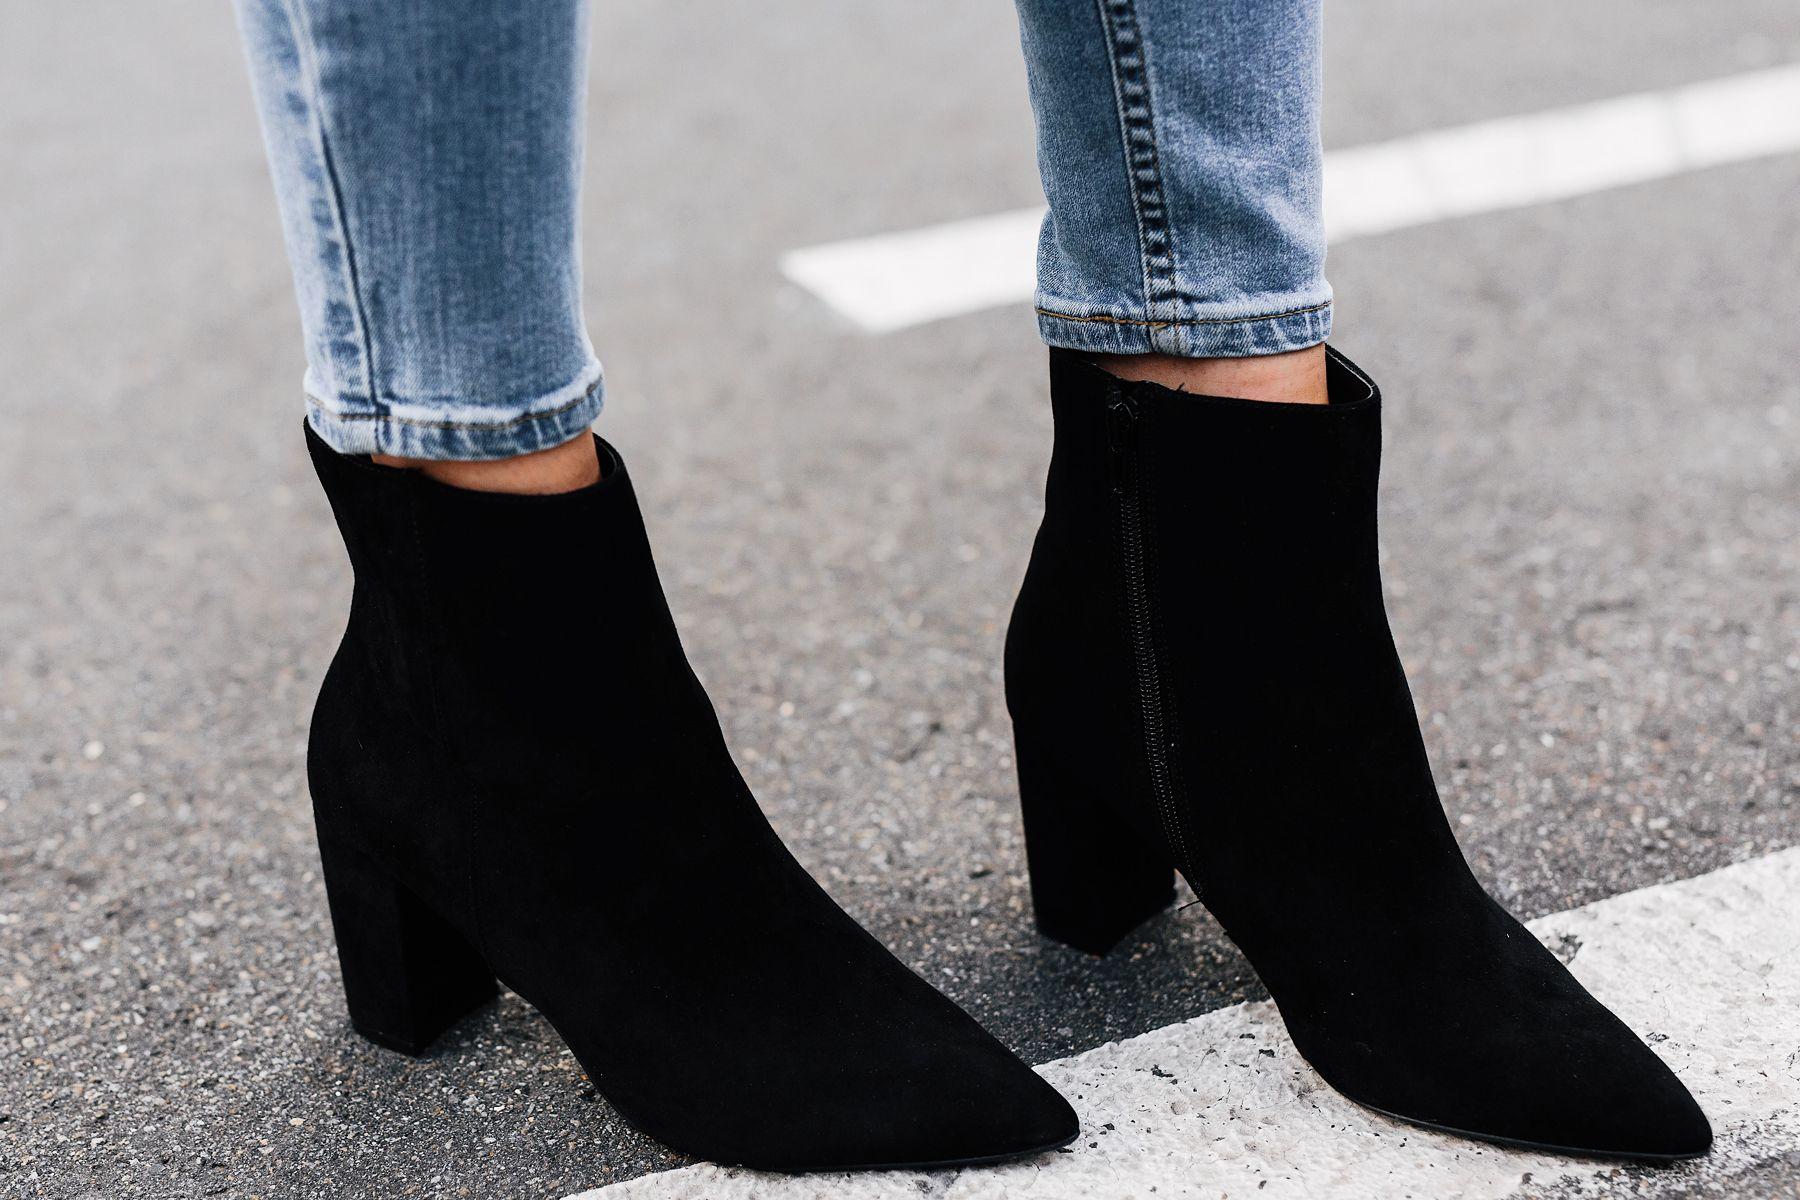 ca09a5226a4 Woman Wearing Steve Madden Andi Black Booties Fashion Jackson San ...